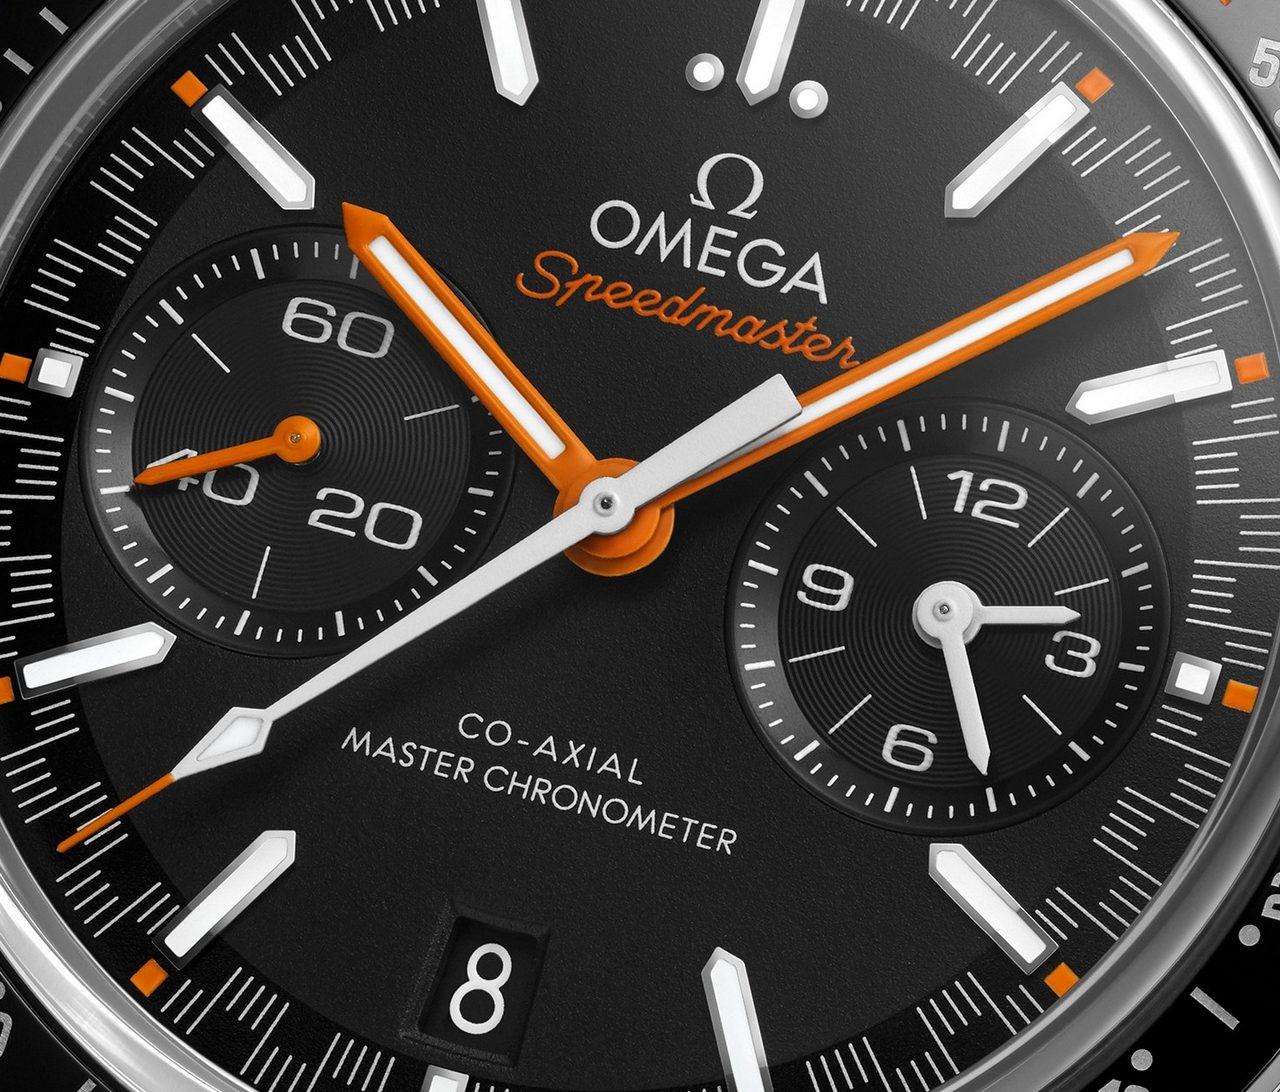 anteprima-baselworld-2017-omega-speedmaster-automatic-prezzo-price_0-1005